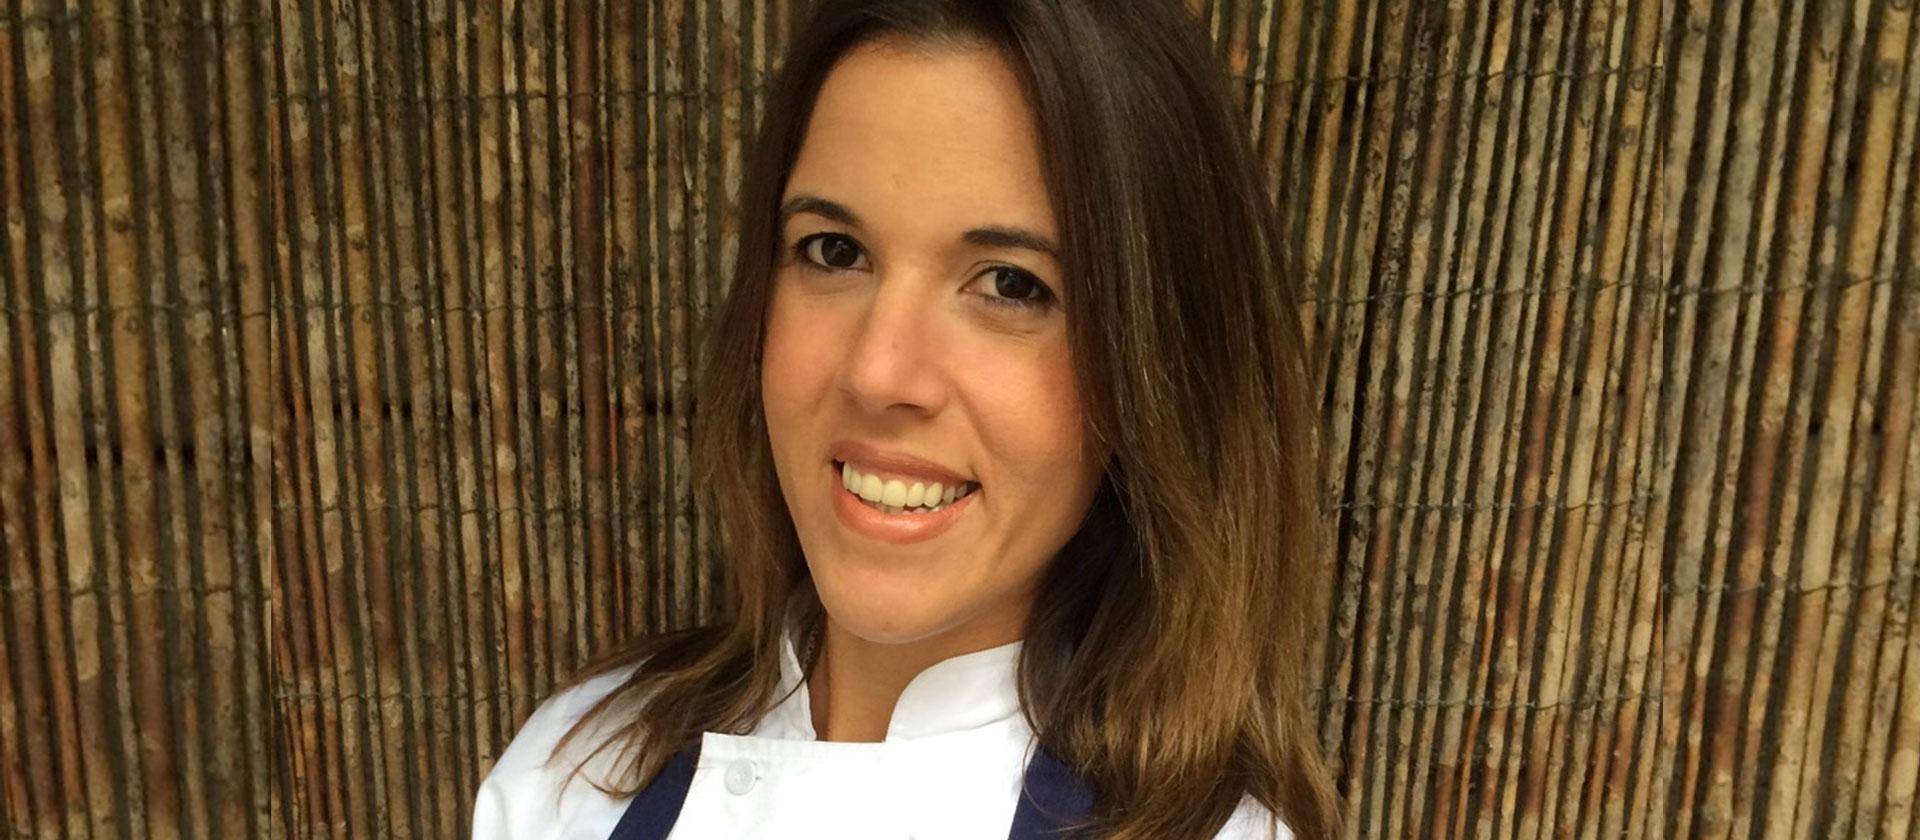 Alumni Luciana BerrySuccess Story - Le Cordon Bleu London